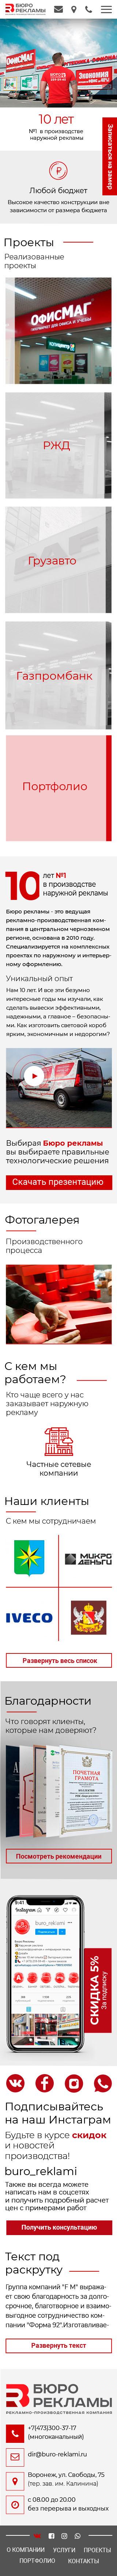 b2b сайты примеры Бюро рекламы 320 px